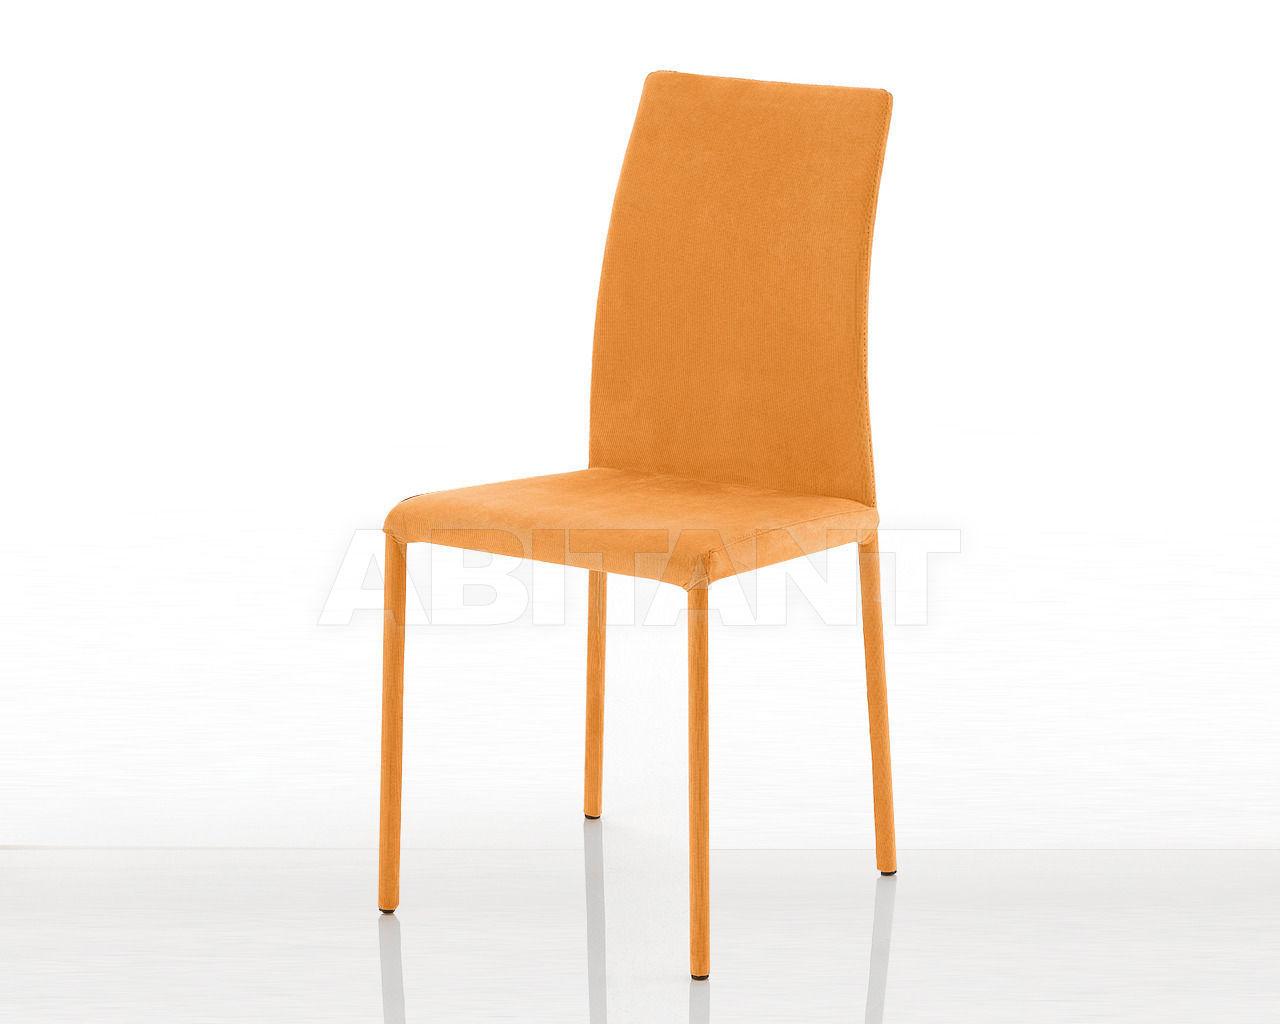 Купить Стул MIRIAM Eurosedia Design S.p.A. 2013 125032 -551032